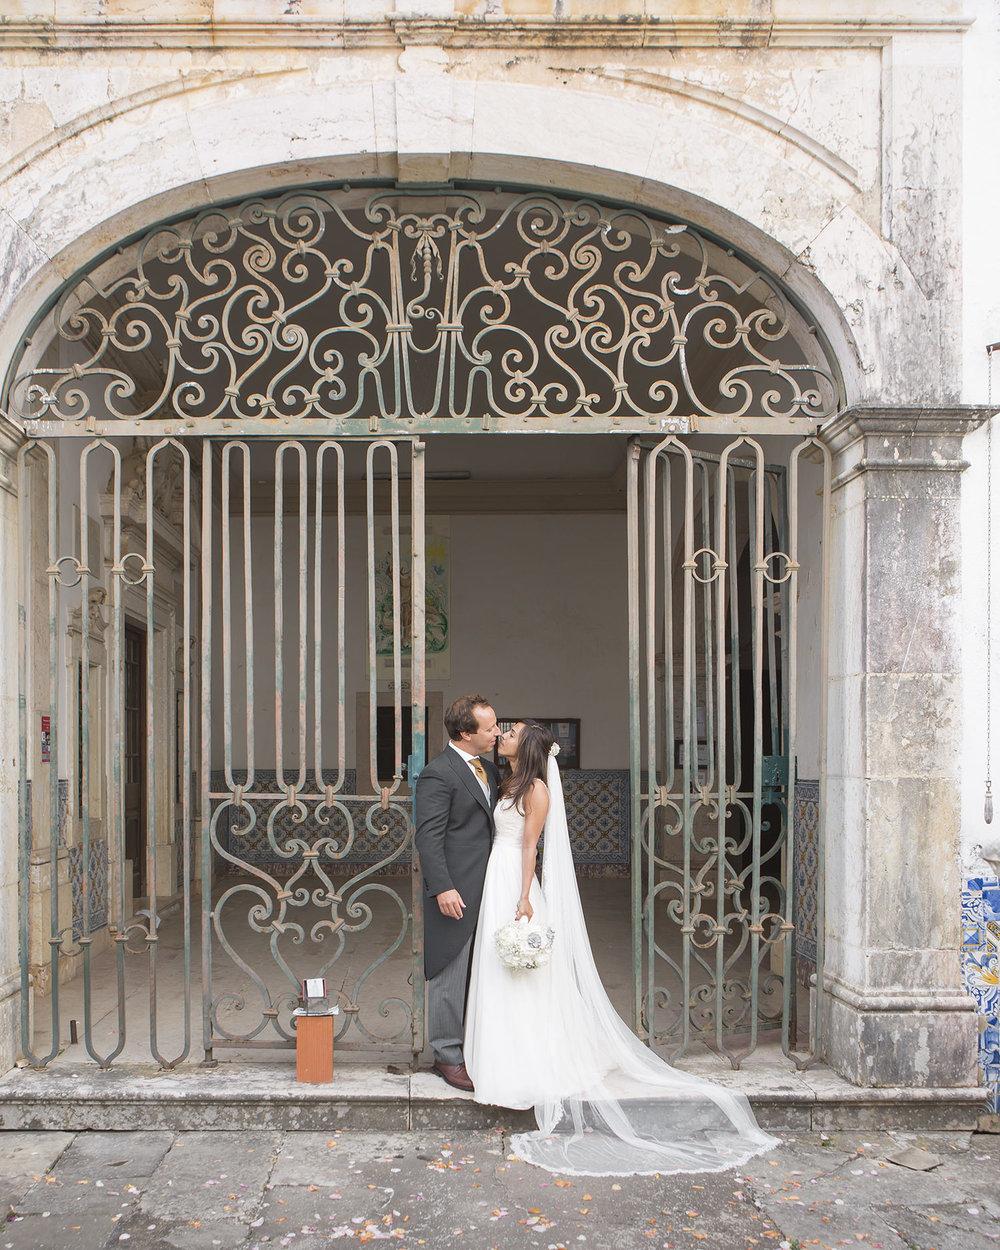 areias-seixo-wedding-photographer-terra-fotografia-104.jpg